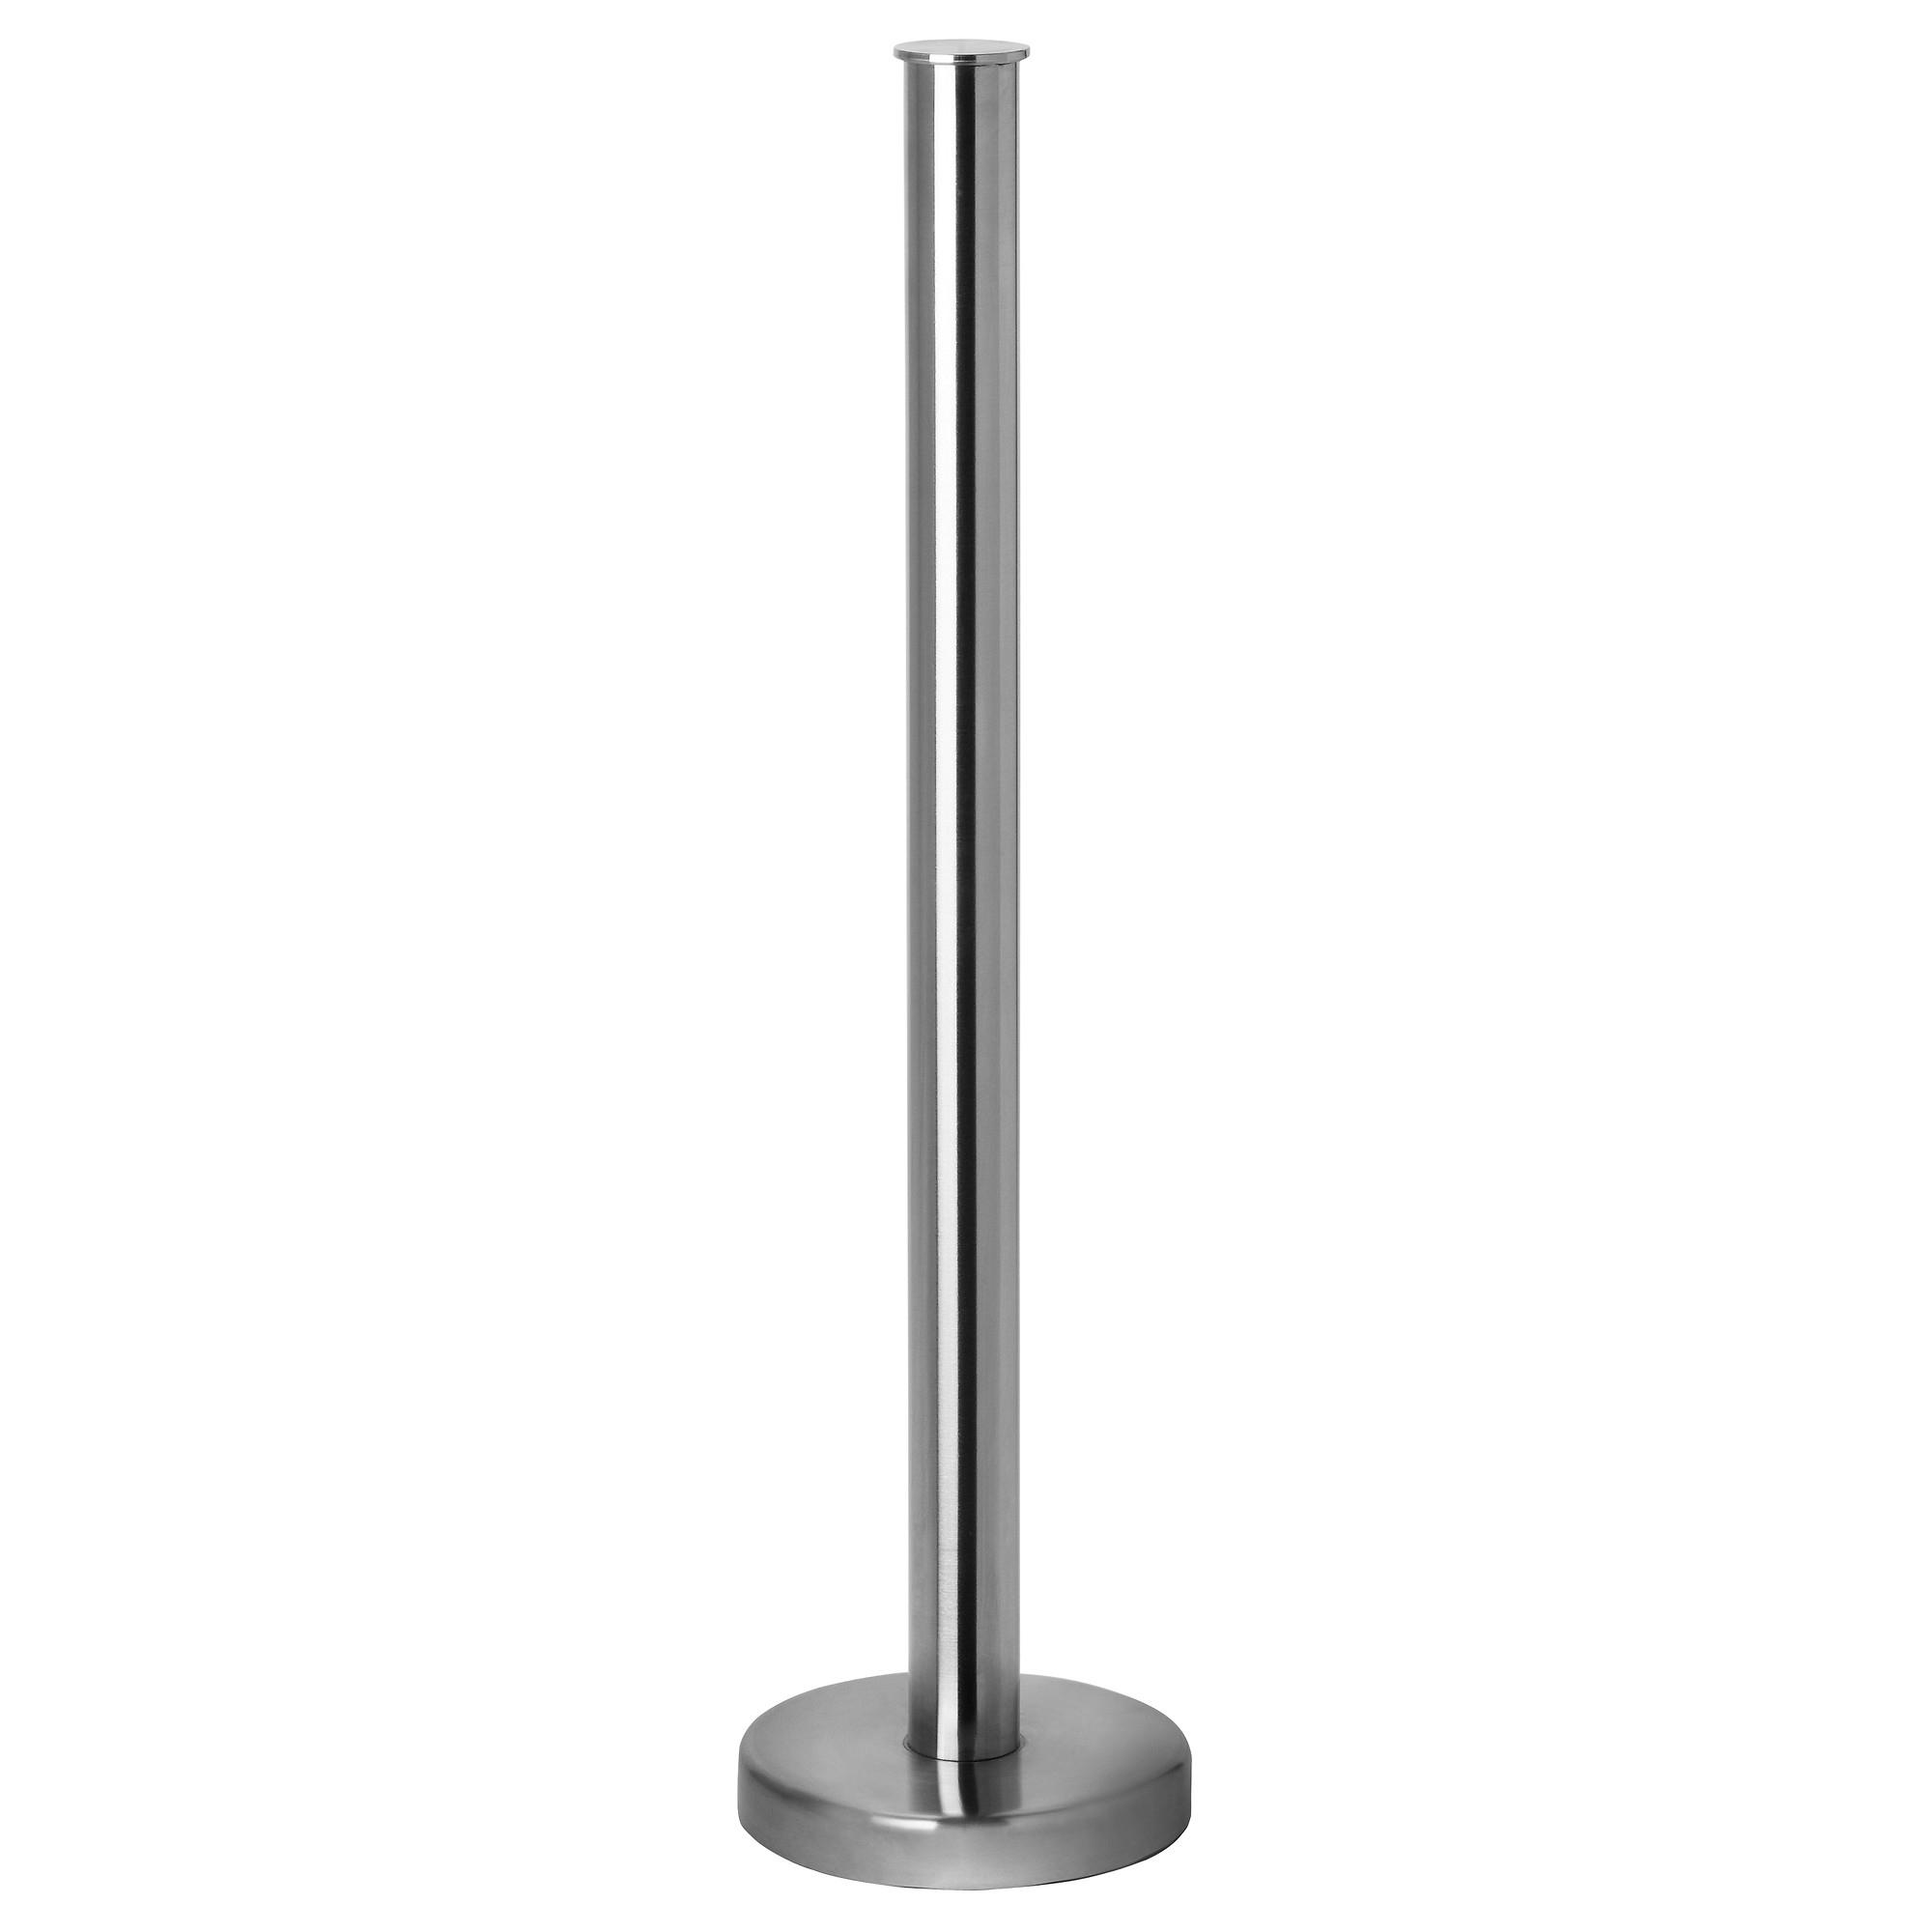 Ikea Variera Door Mounted Storage ~ GRUNDTAL portarrollos